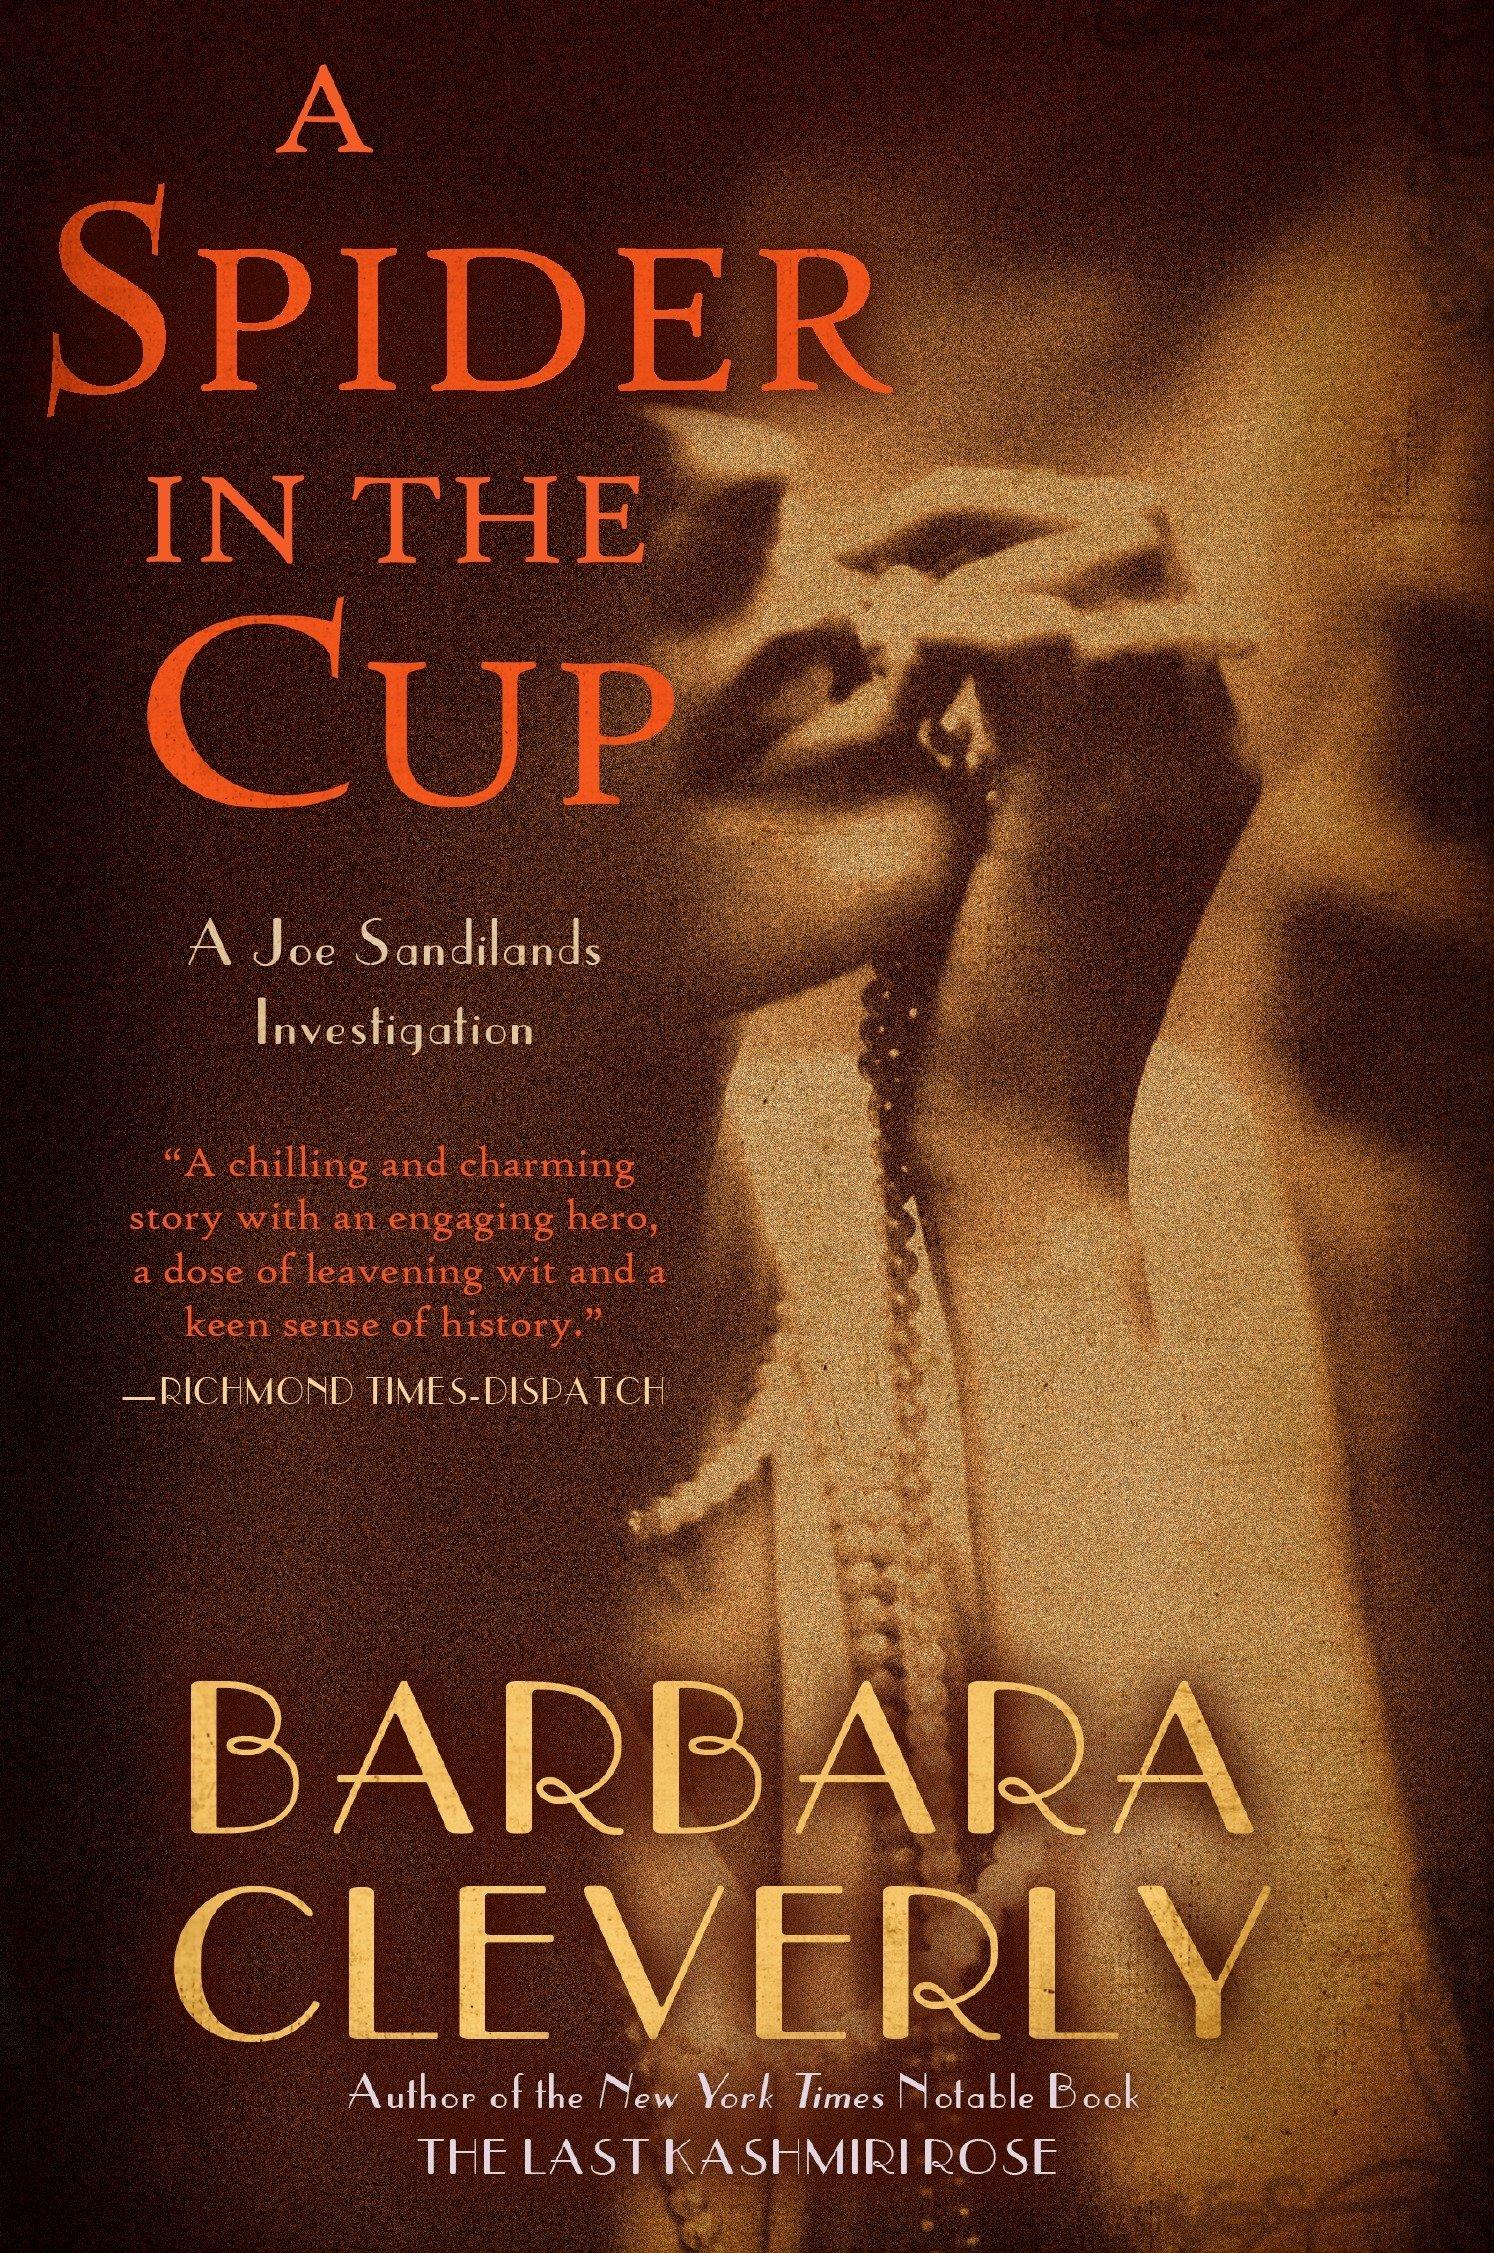 A Spider in the Cup (A Detective Joe Sandilands Novel) PDF